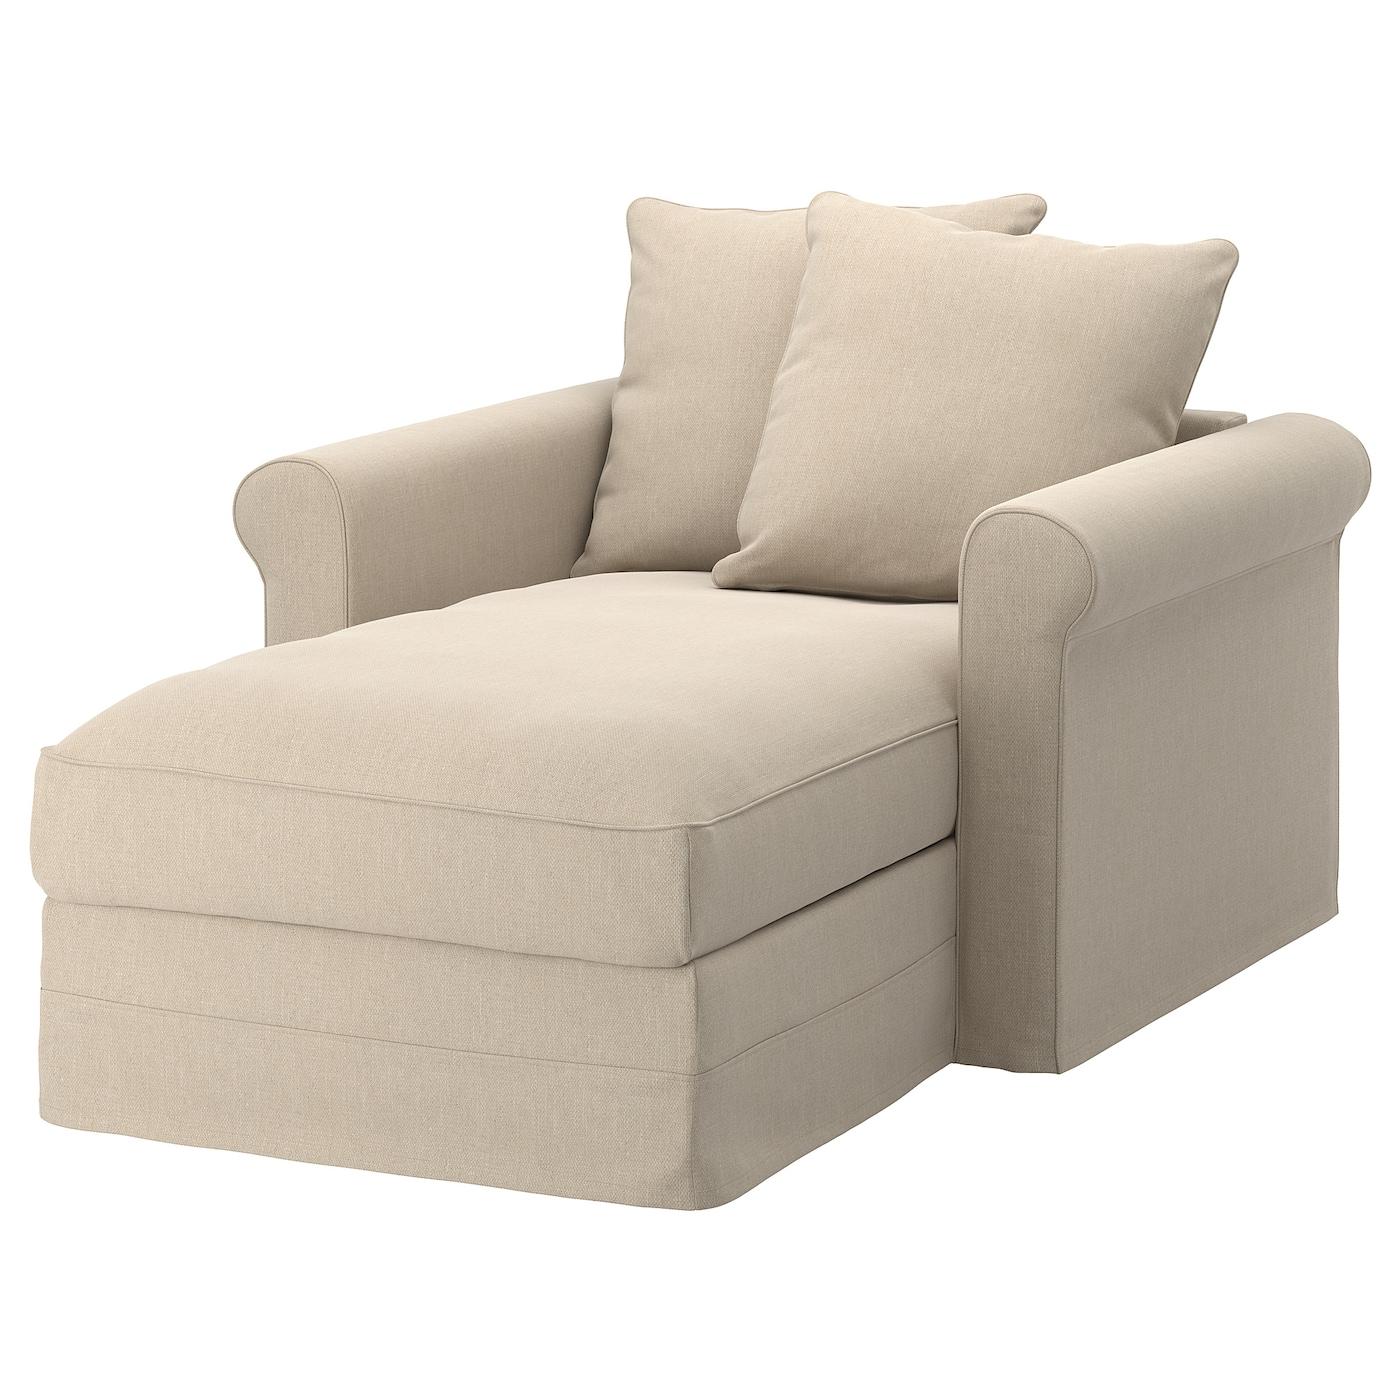 Armchairs & chaise longues IKEA